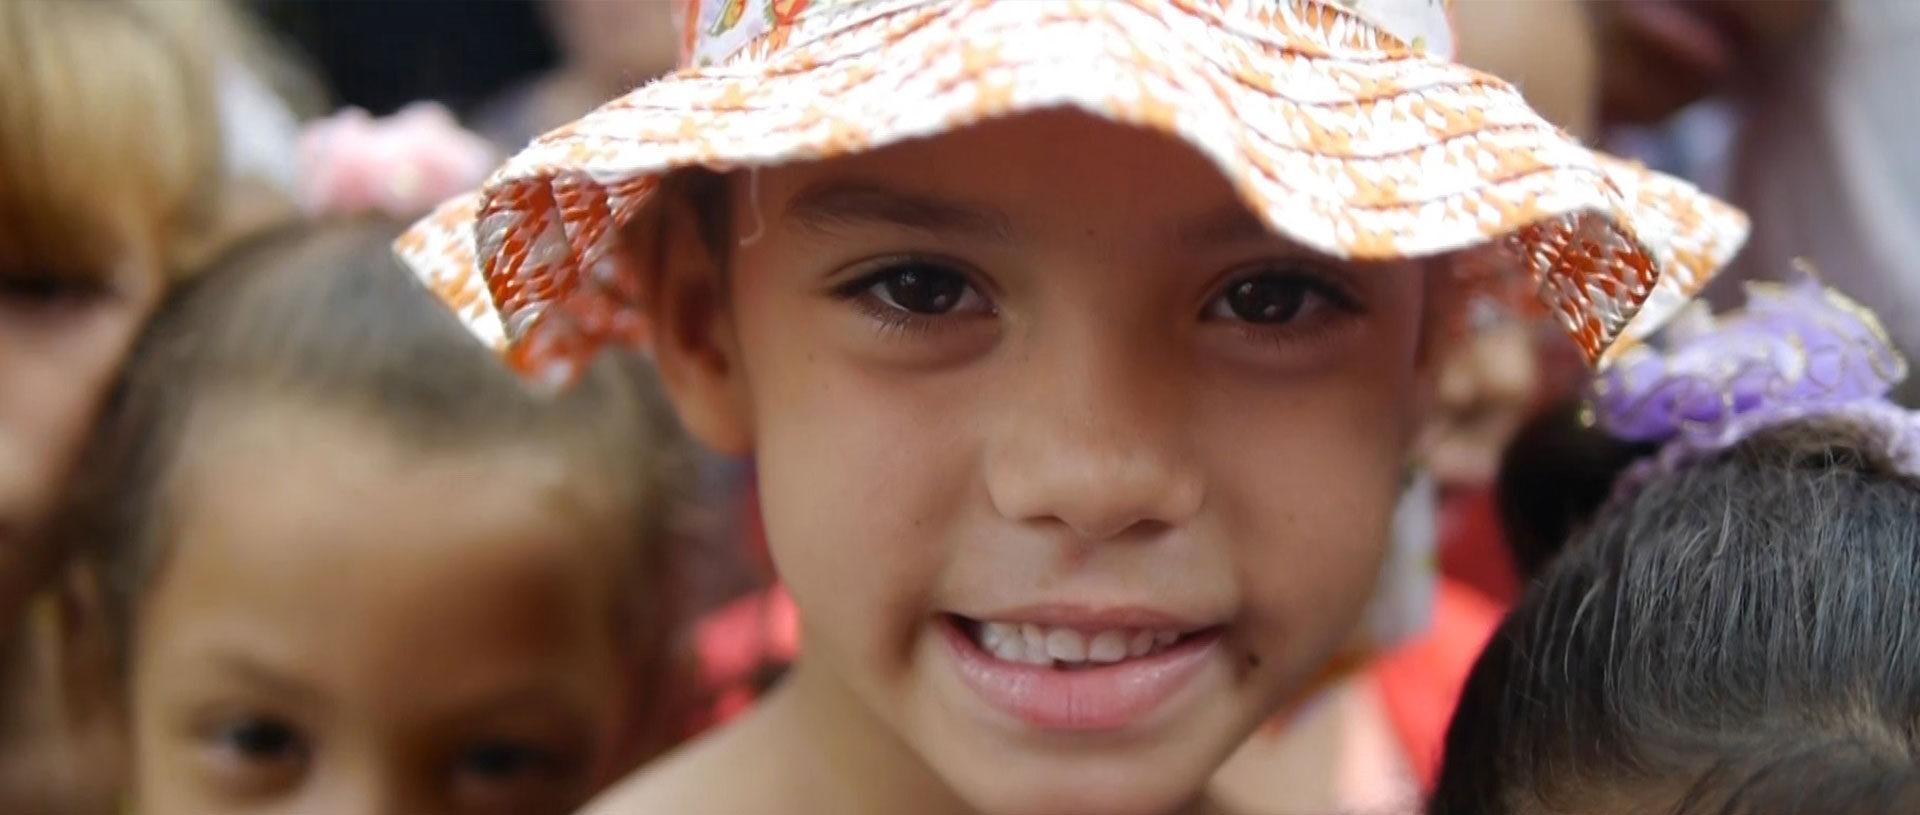 Brighter futures for children in Cuba banner